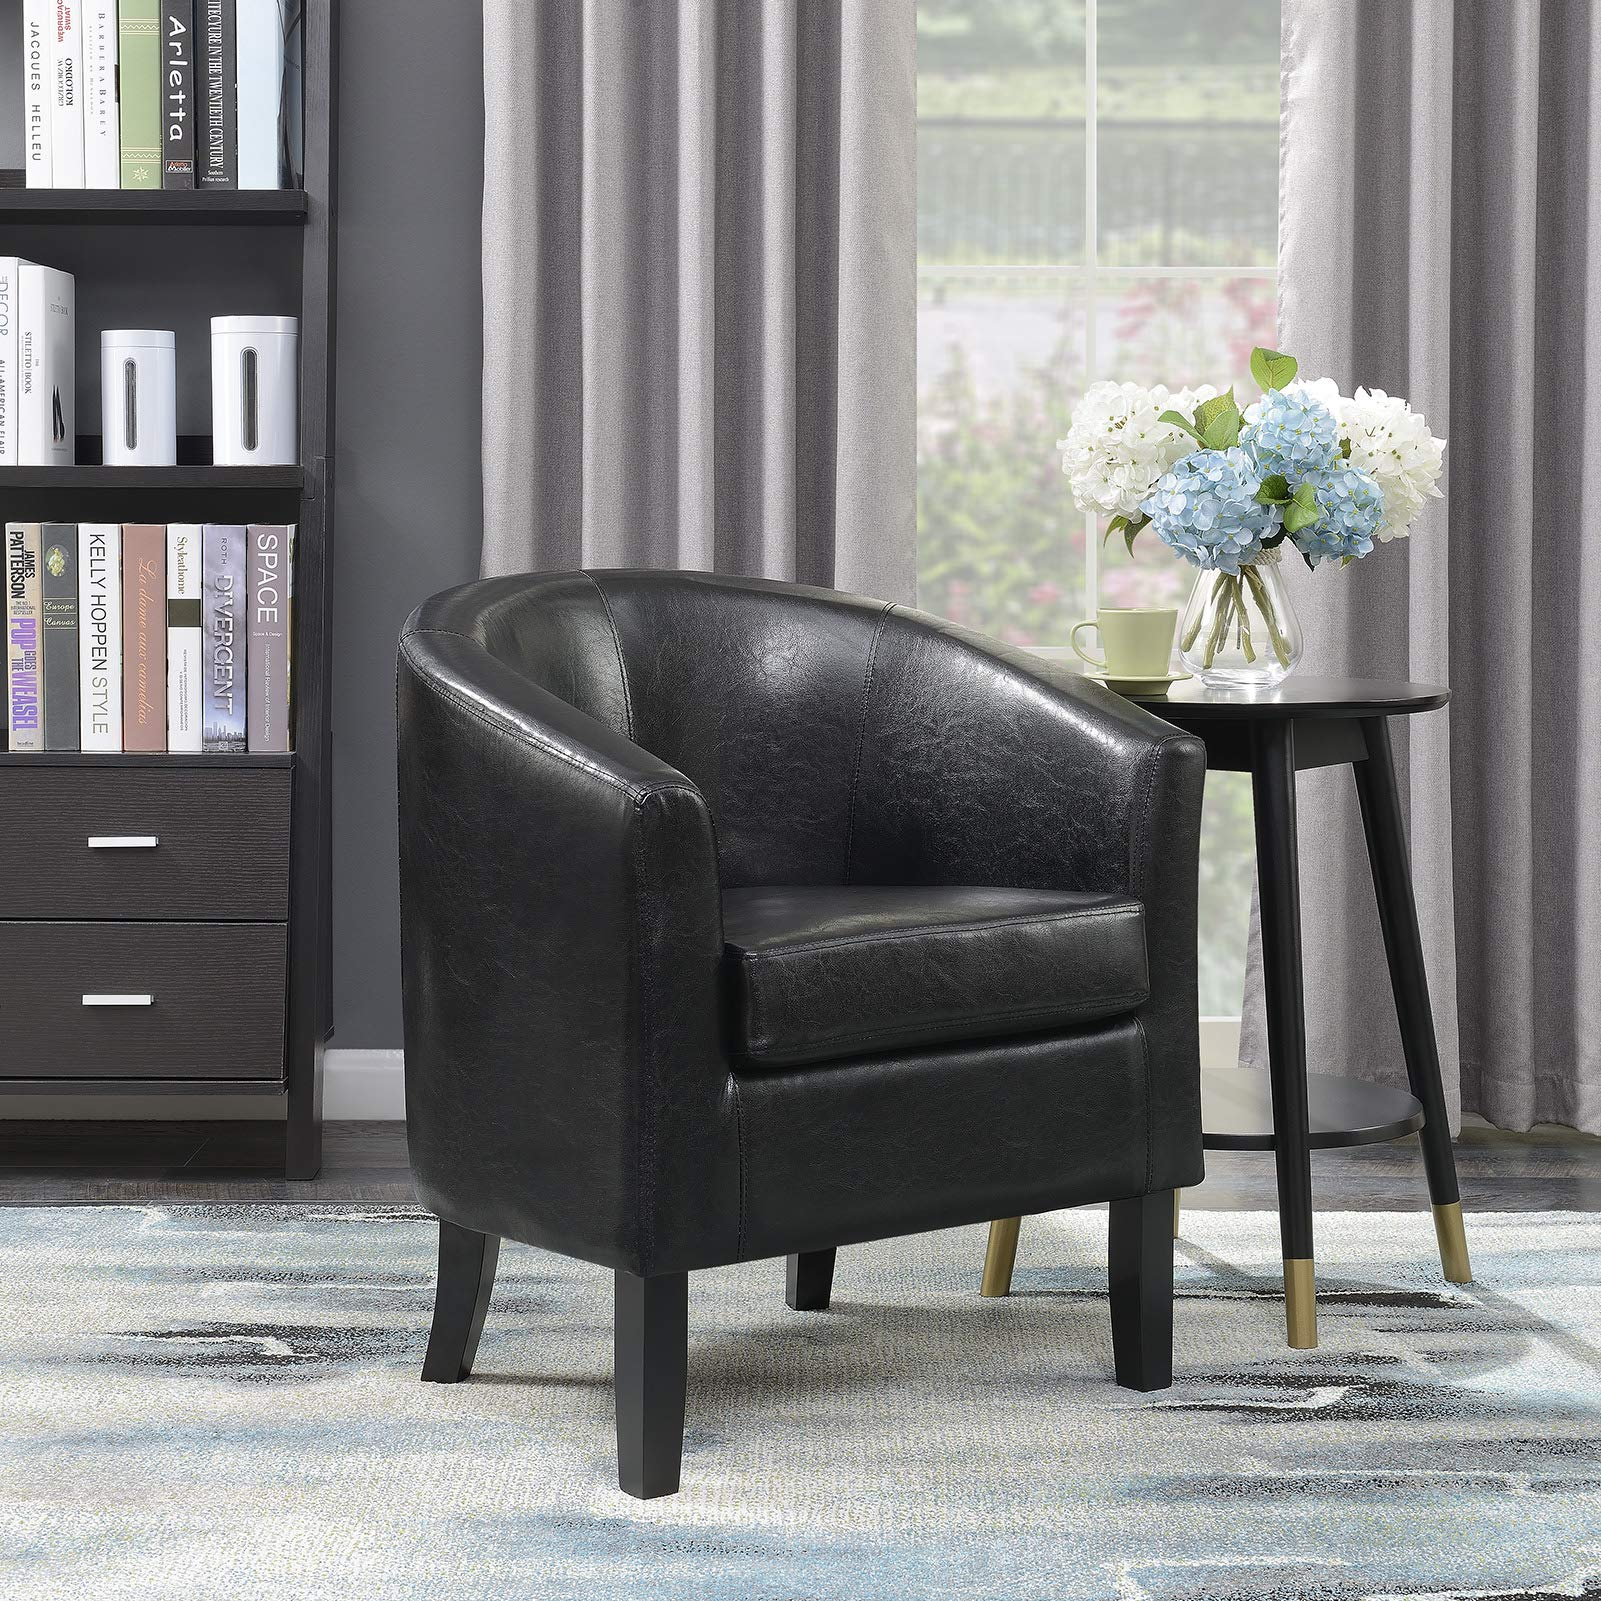 Belleze Modern Club Chair Accent Elegance Faux Leather Living Room Armrest Elegance Seat, Black by Belleze